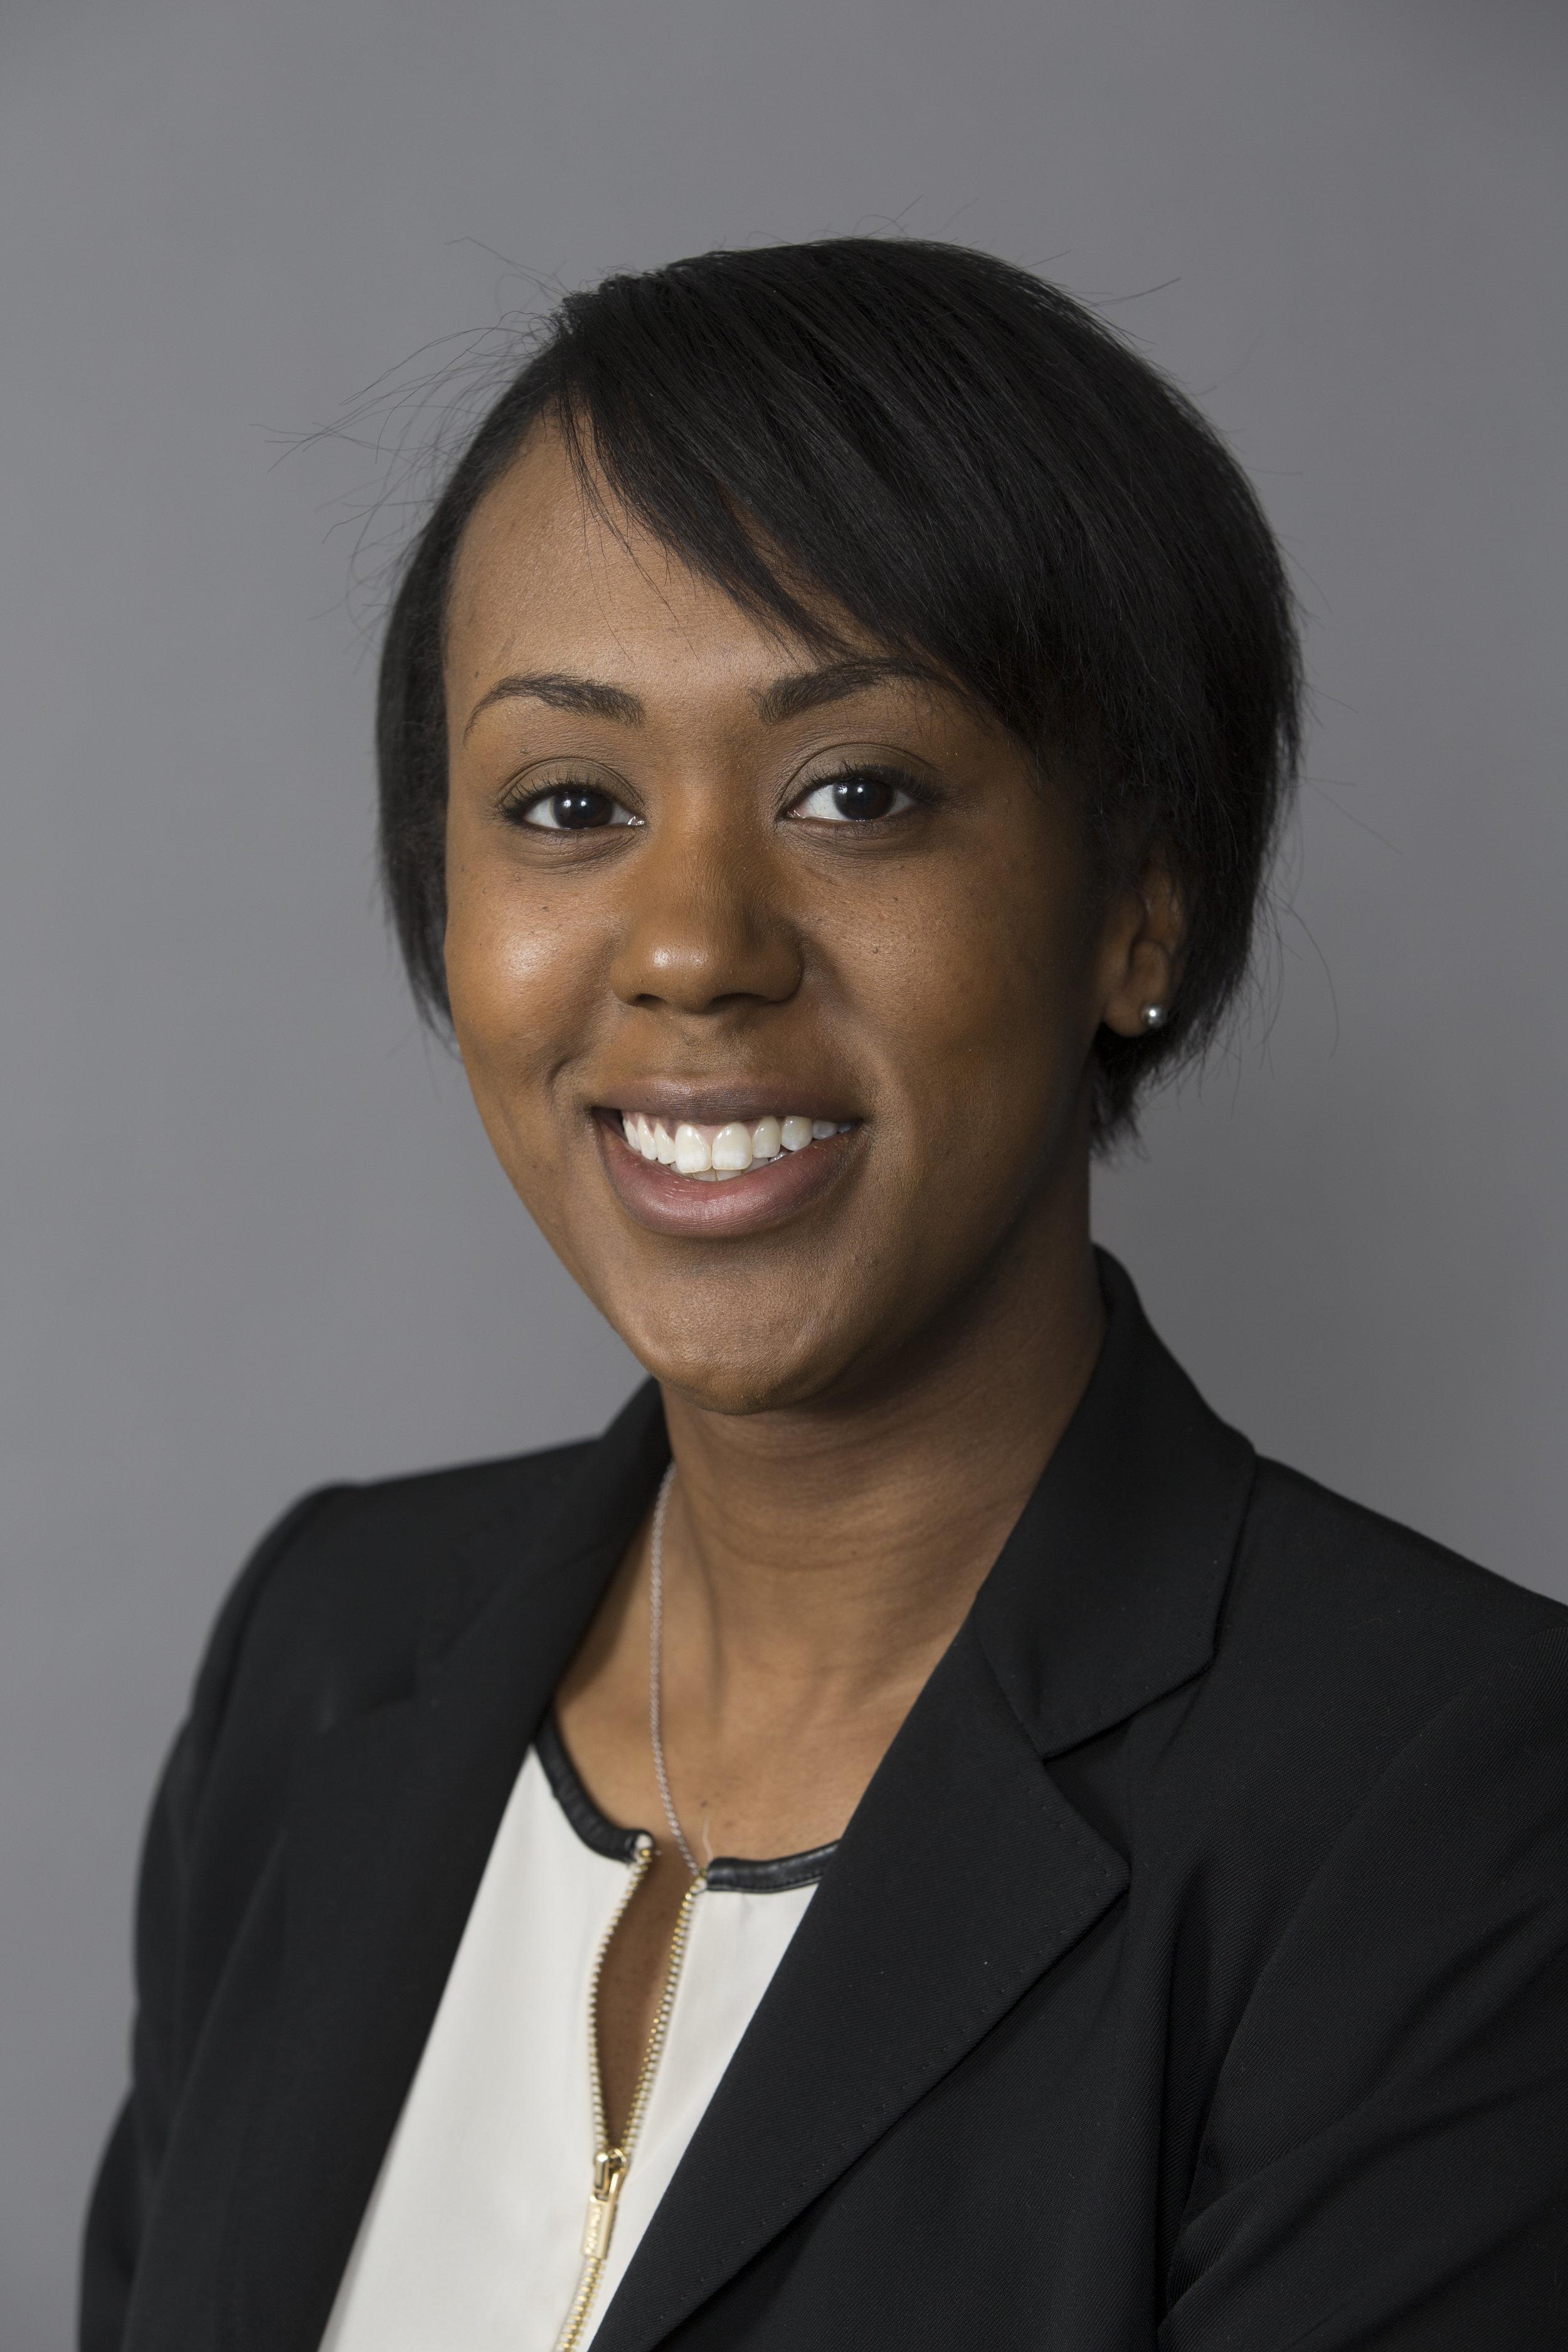 PLANC Communications Coordinator (2018-2020) - Veronica Joiner, Sr. Academic AdvisorPre-Professional Advising CenterUniversity of CincinnatiPhone: 513-556-2166veronica.joiner@uc.edu